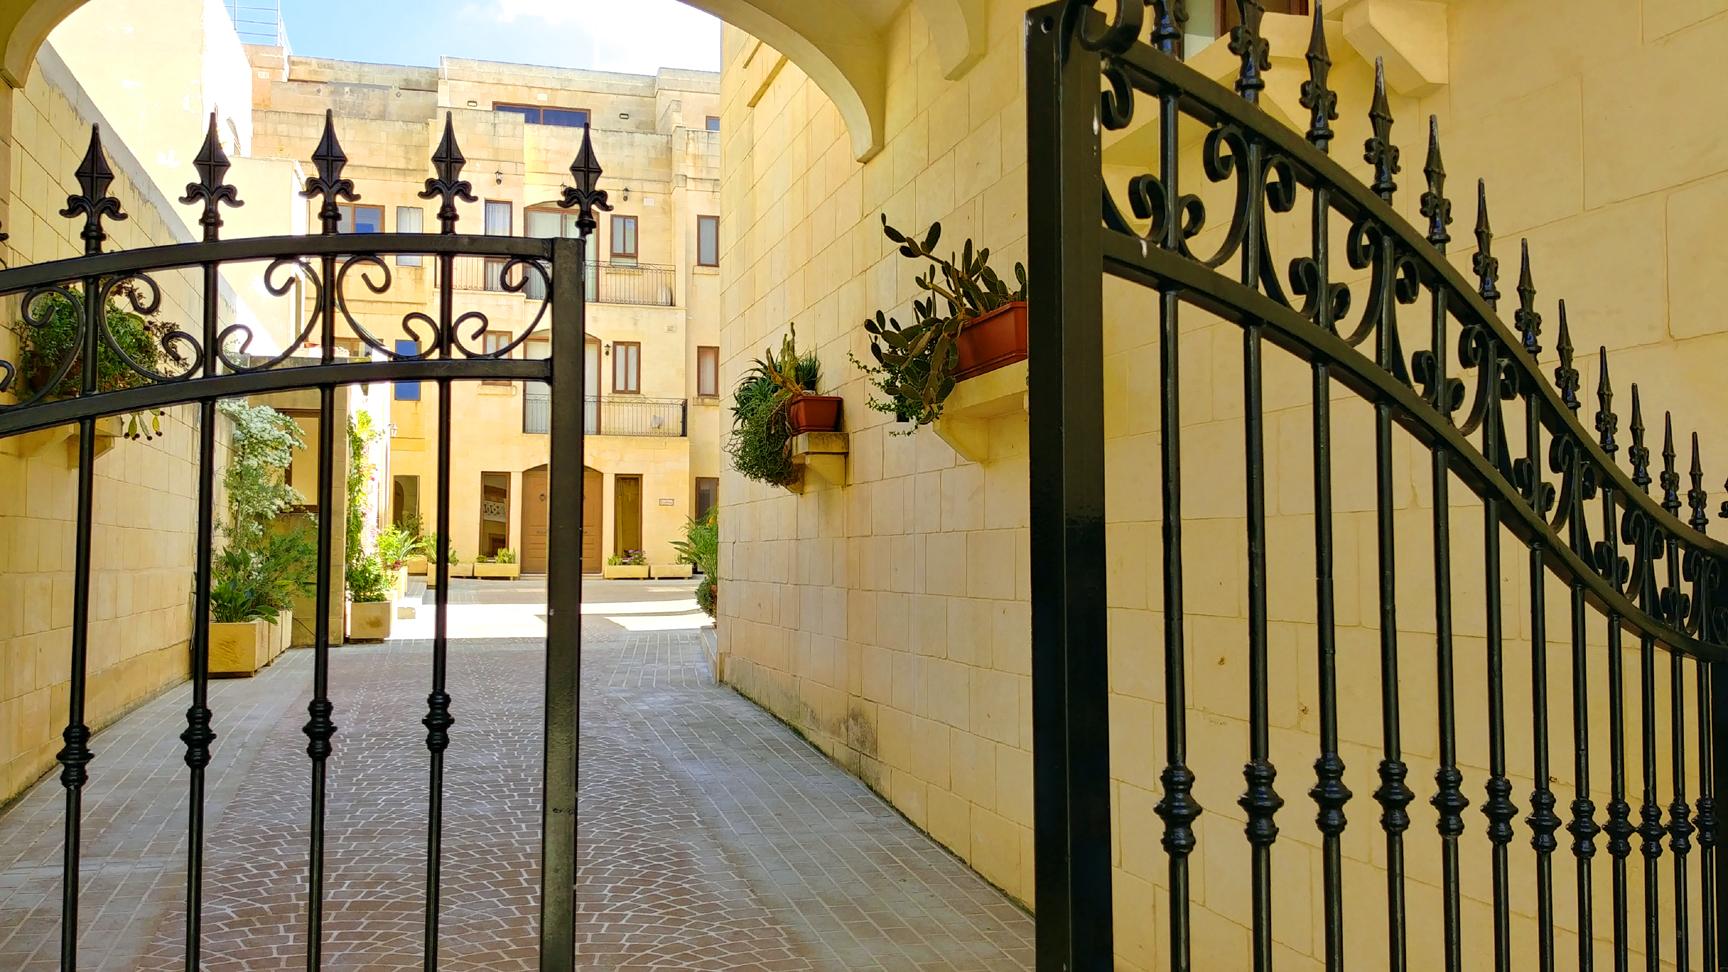 30-Days in Malta. Courtyard for Ghajnsielem Gozo apartment. Photo: Charlebois